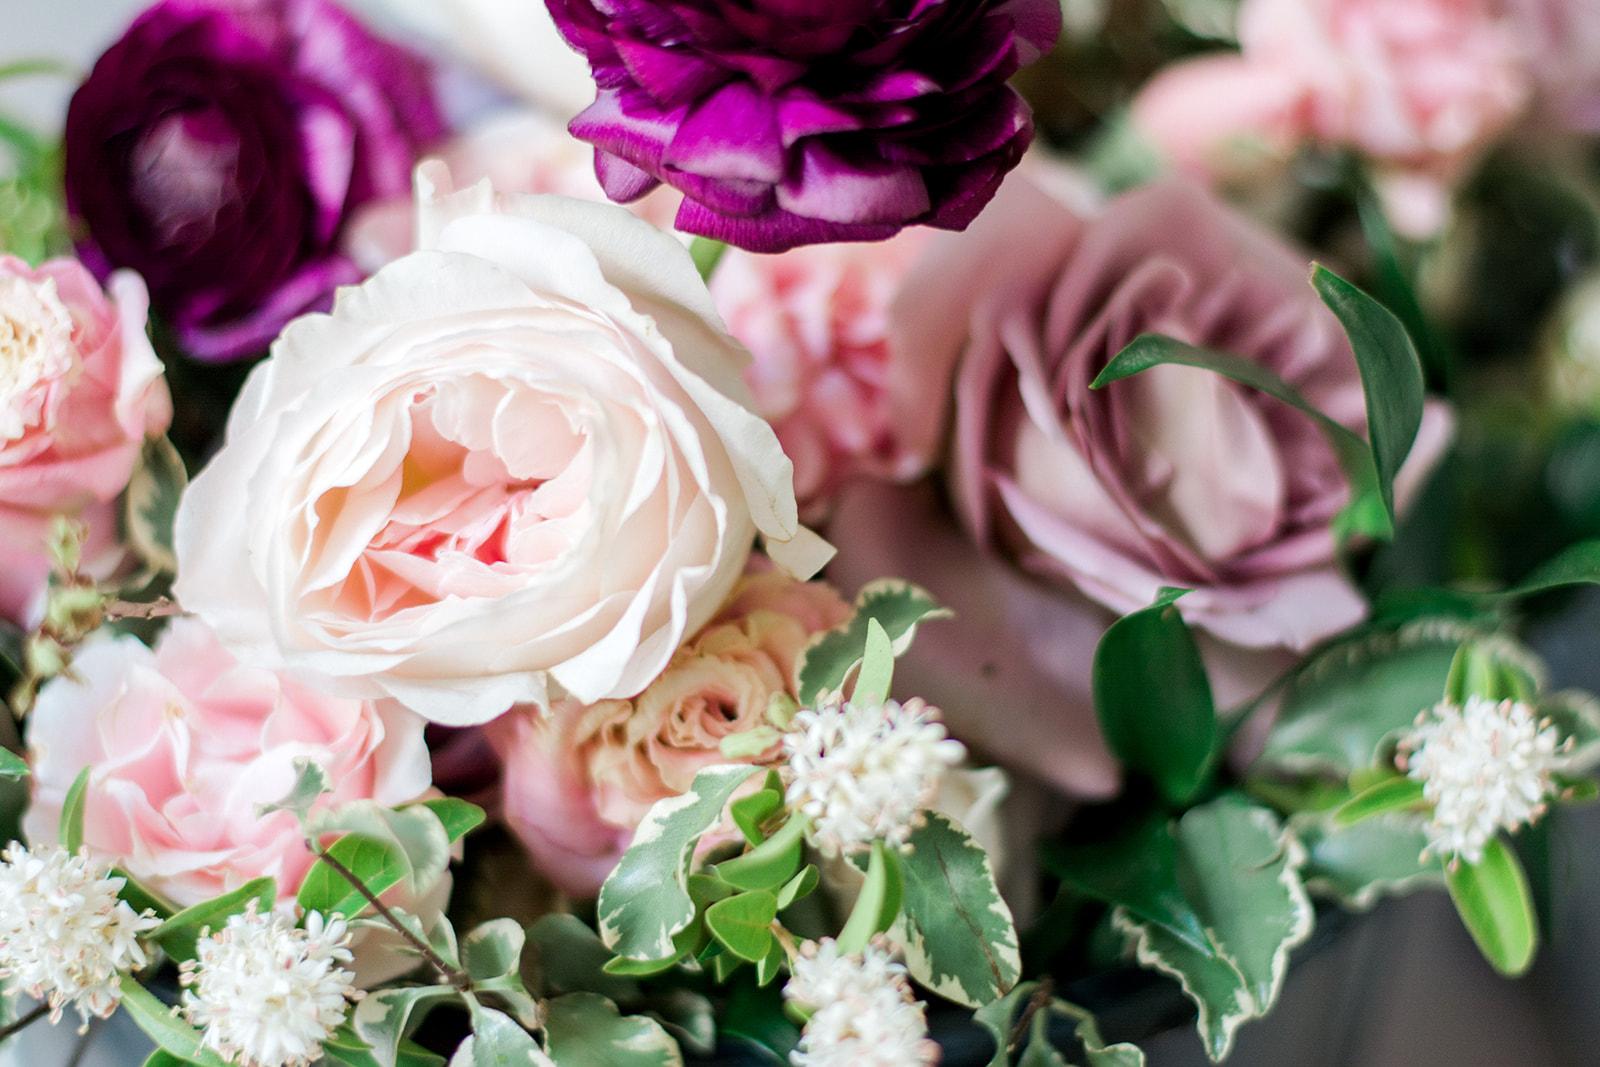 ivory-and-beau-savannah-bridal-boutique-savannah-wedding-dresses-savannah-bridesmaids-dresses-savannah-bridal-shop-jenny-yoo-rebecca-ingram-bridal-gown.jpg